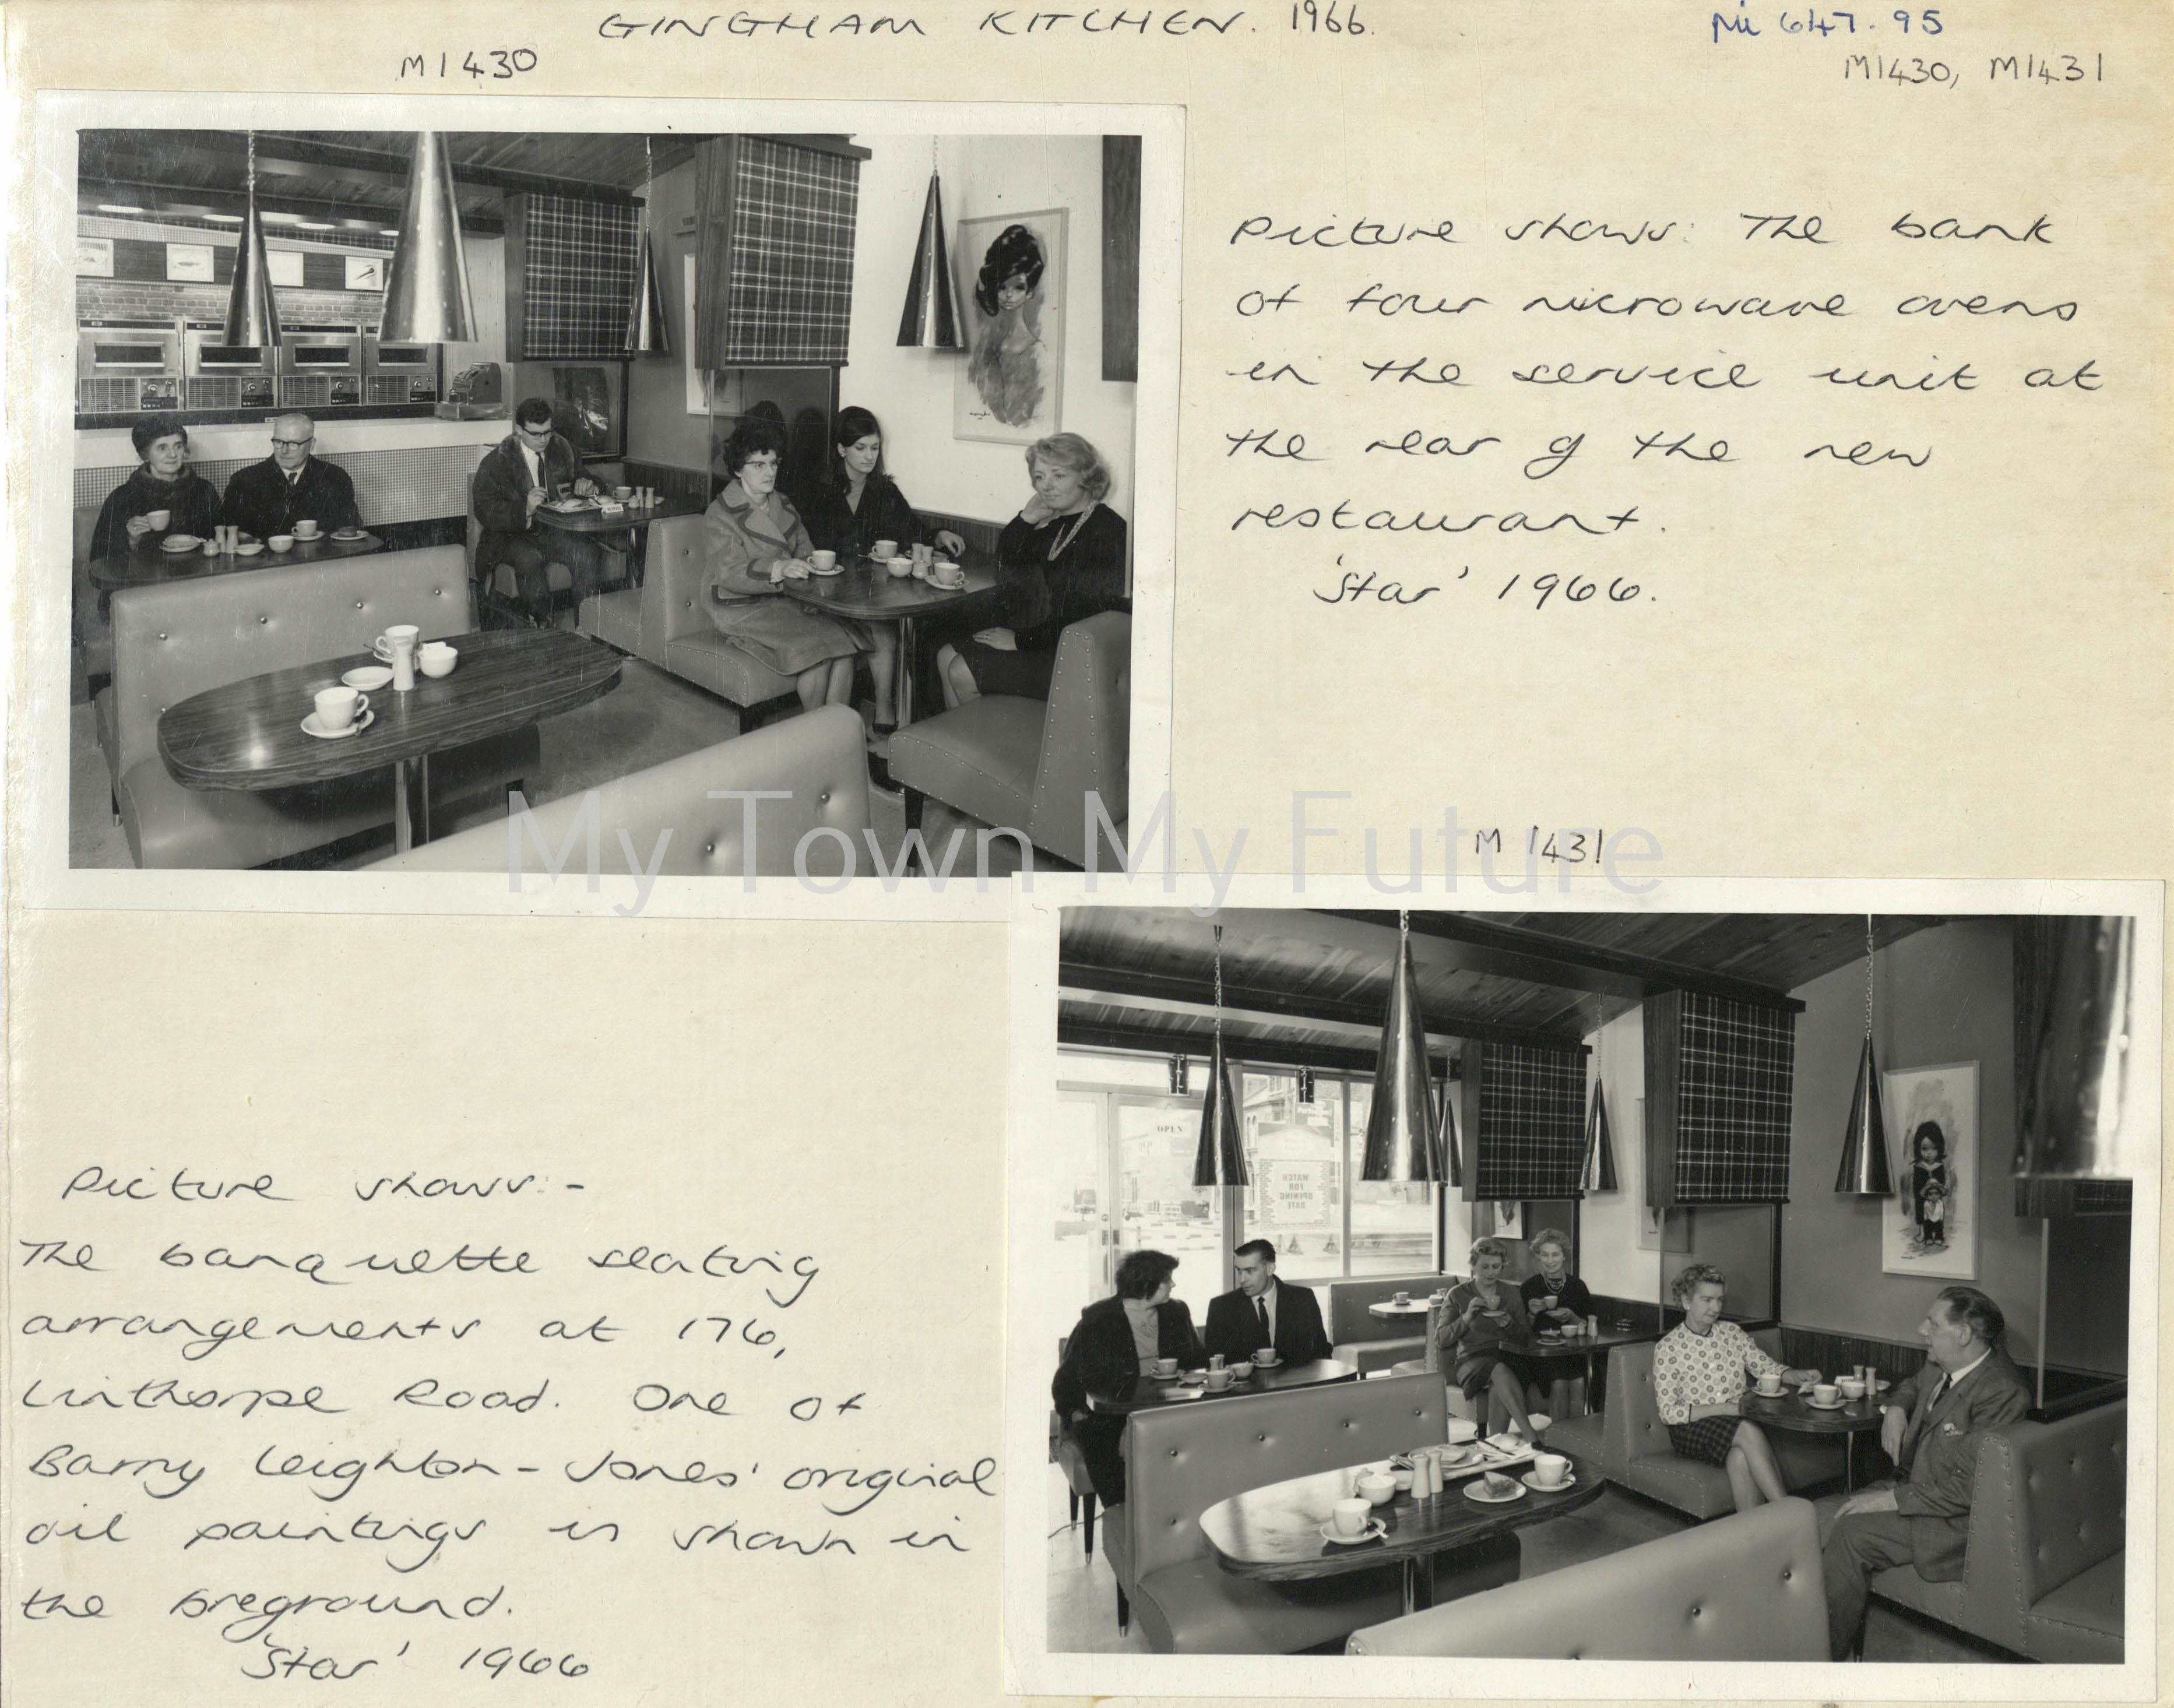 Middlesbrough Gingham Kitchen, 1966